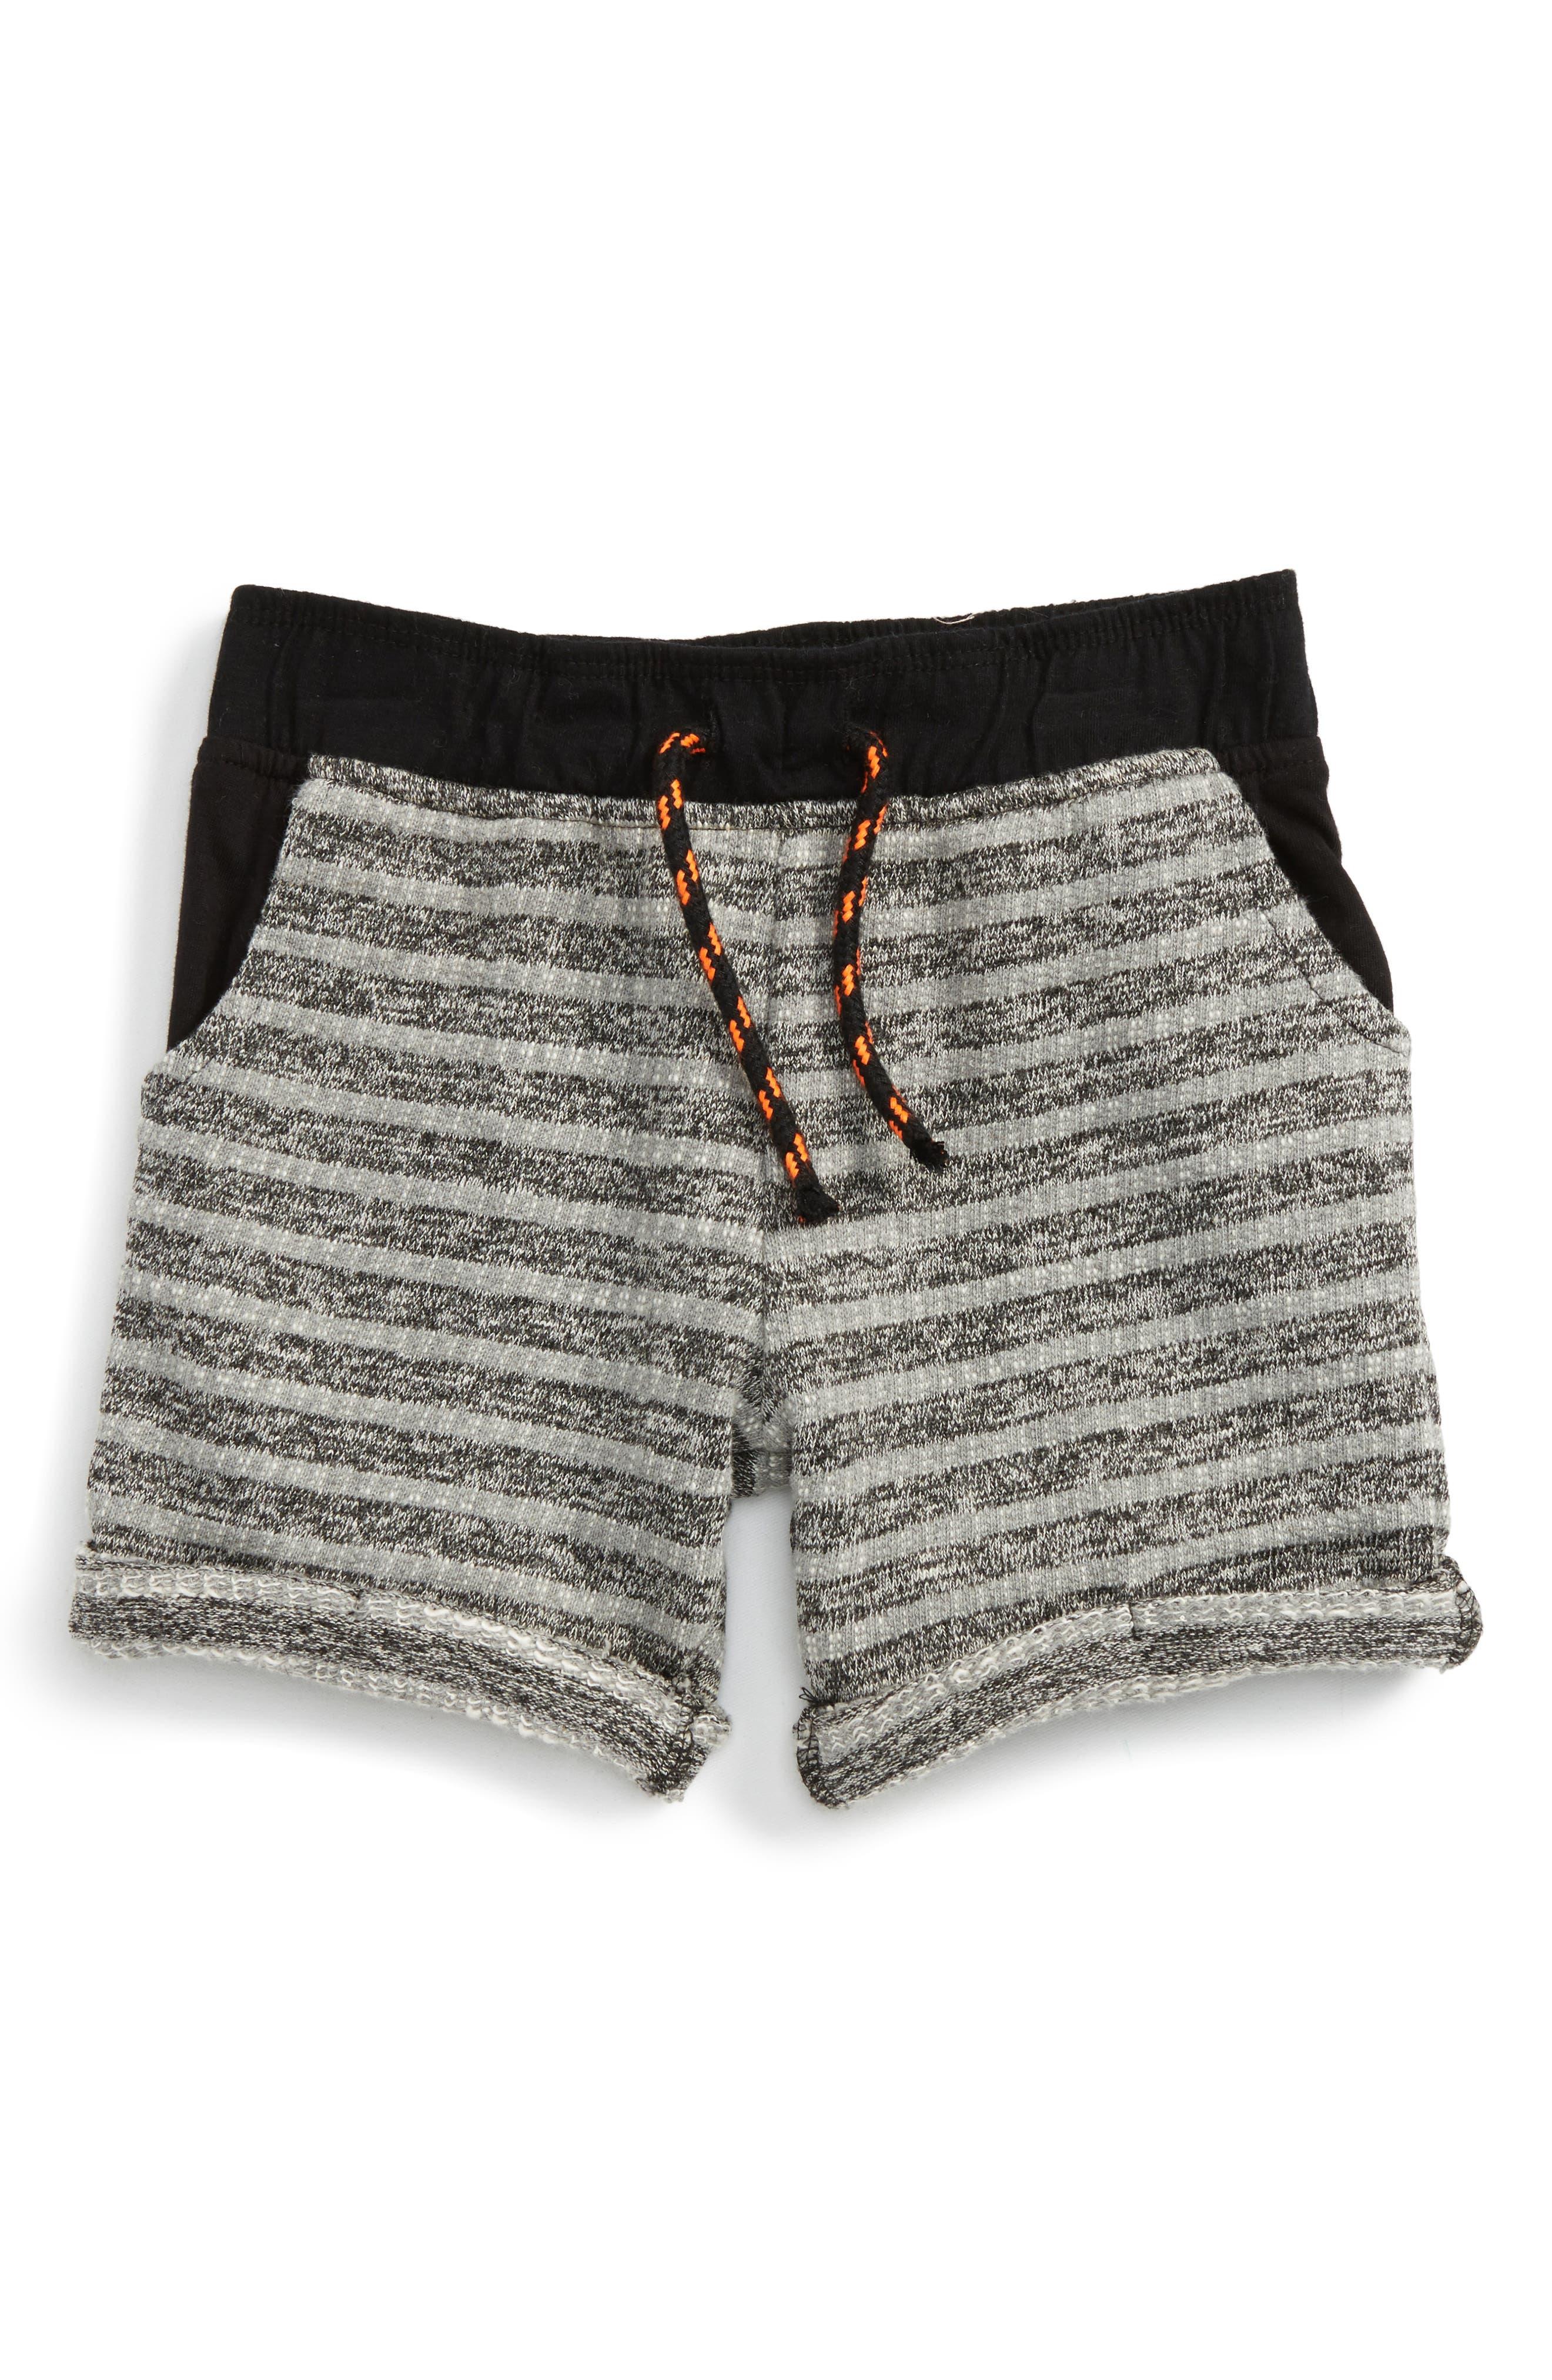 Alternate Image 1 Selected - Peek Jordan Stripe Shorts (Toddler Boys, Little Boys & Big Boys)